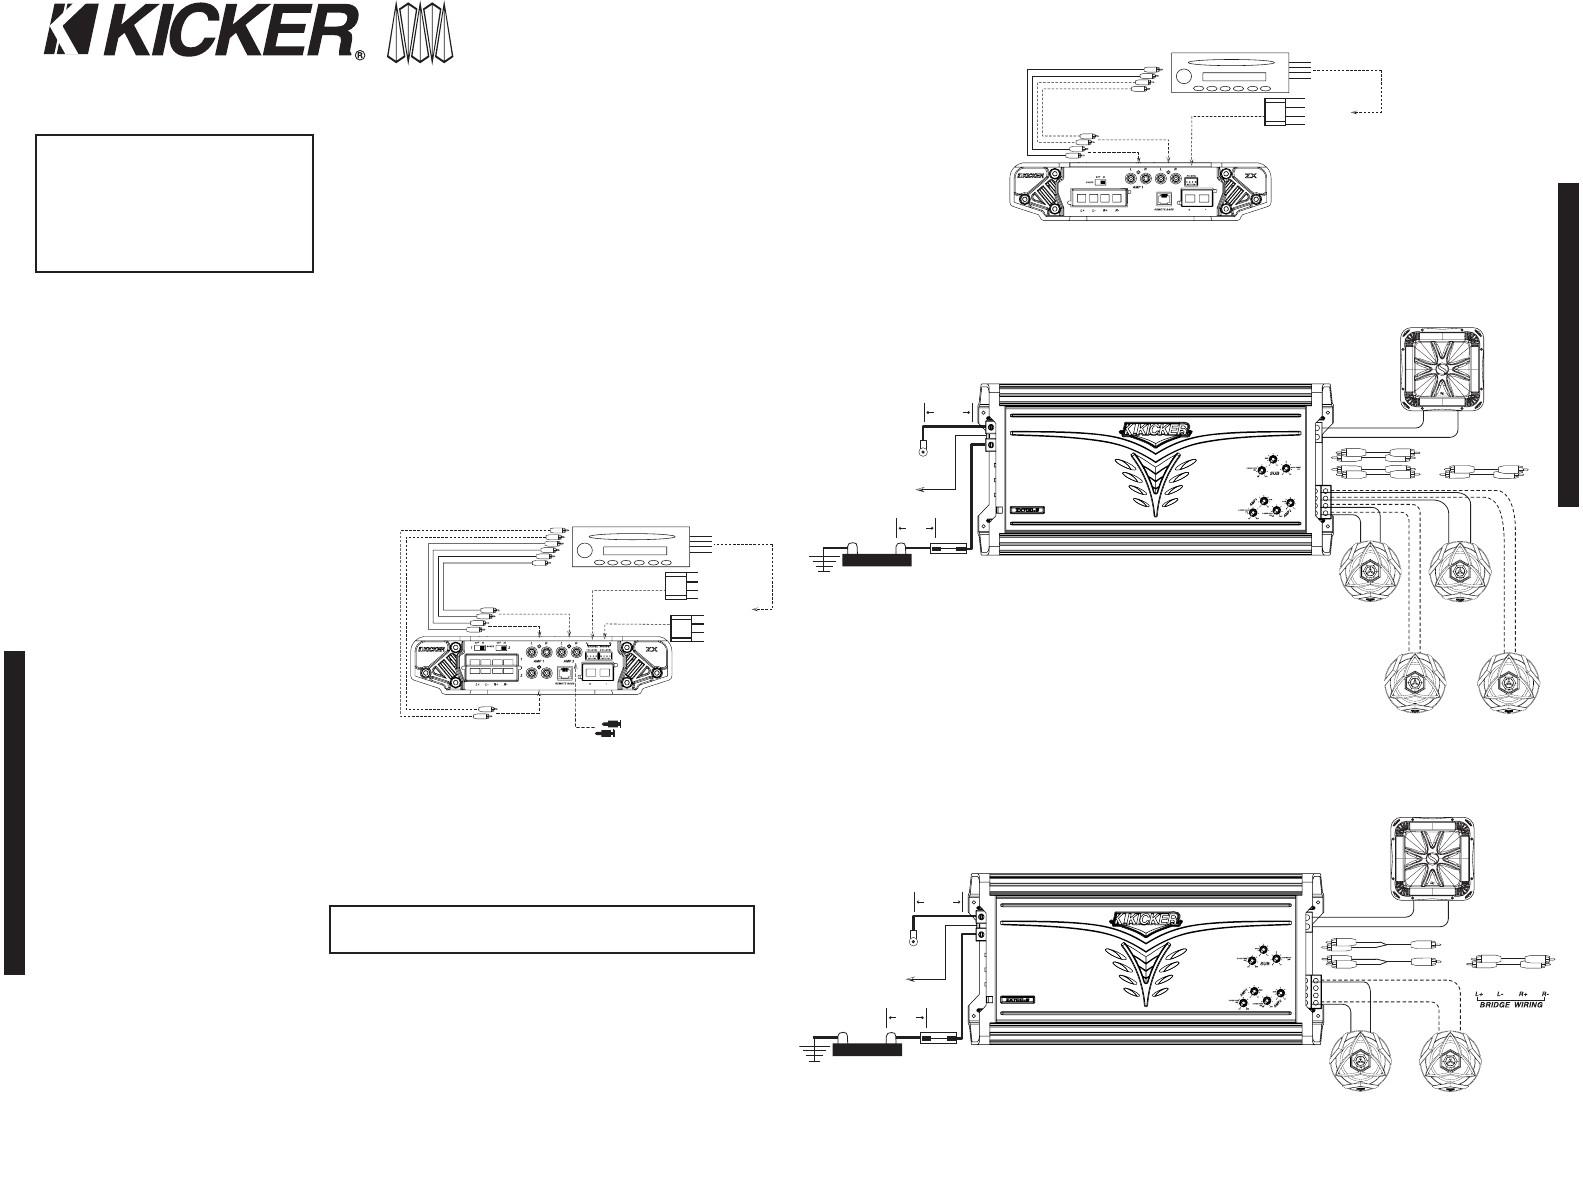 [ZL_7858] Kicker Wiring Harness Free Diagram